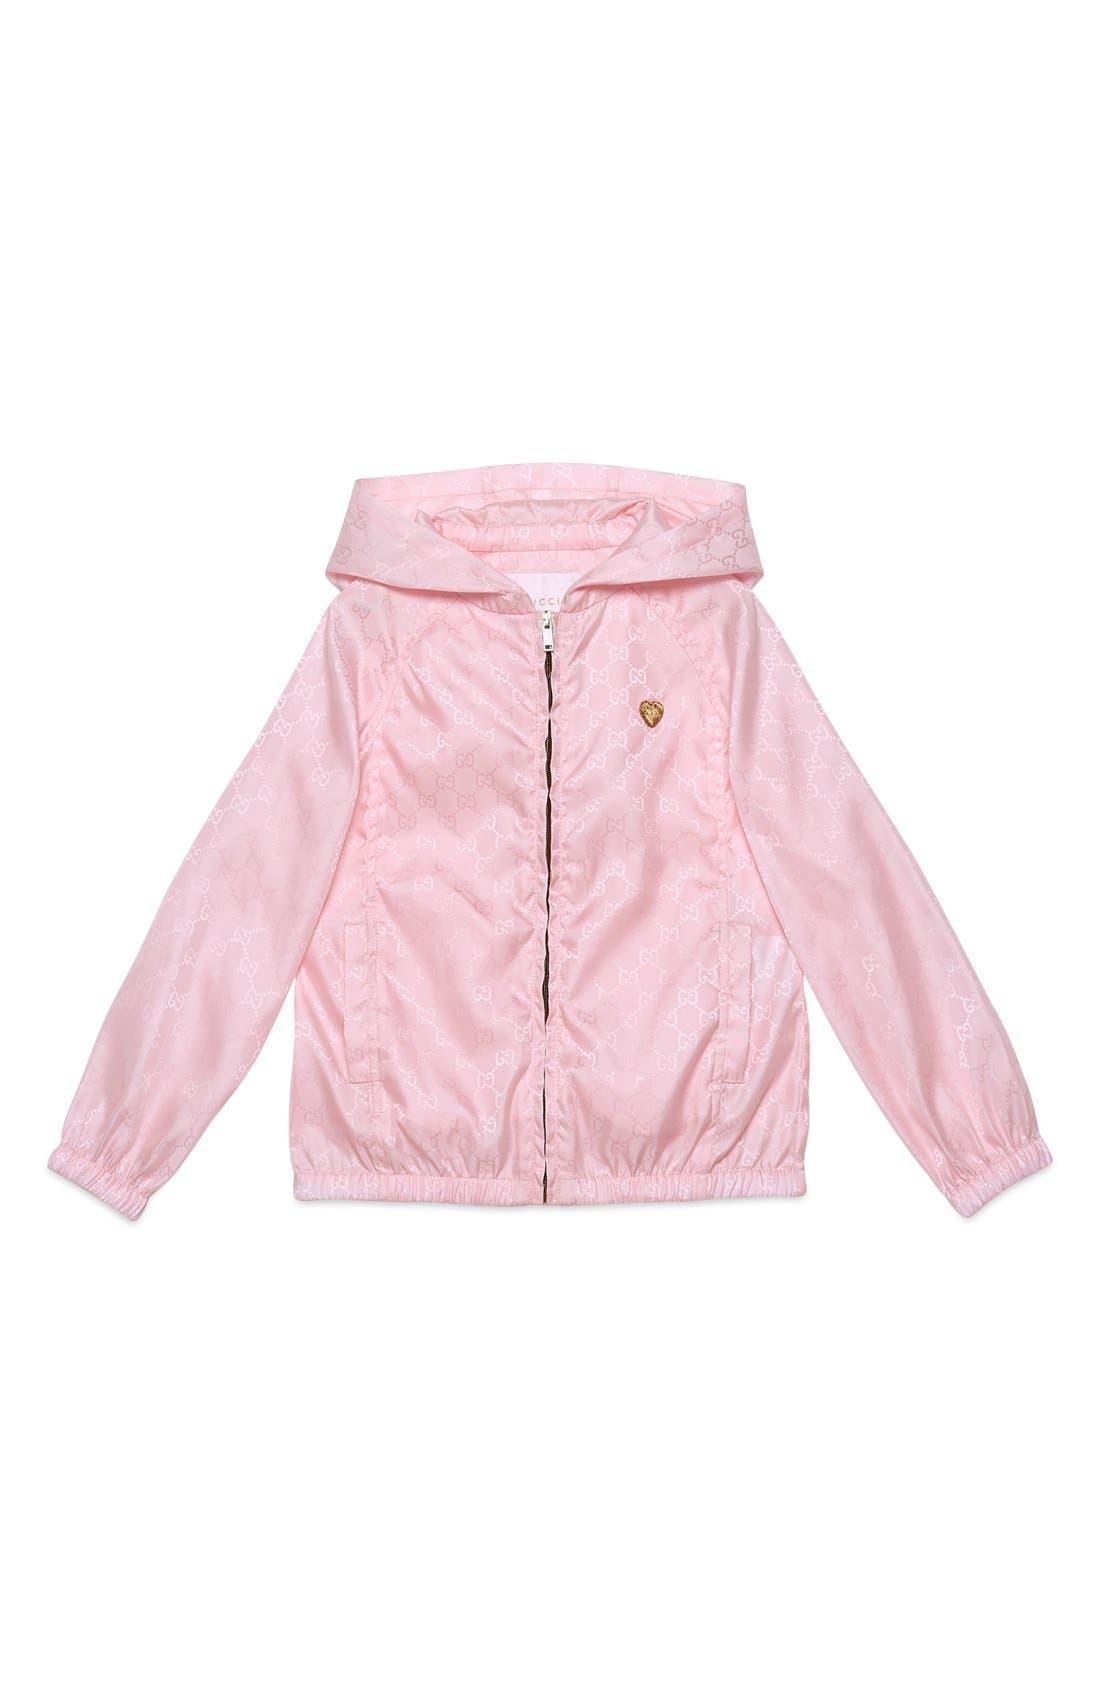 Alternate Image 1 Selected - Gucci Logo Jacquard Nylon Jacket (Little Girls & Big Girls)